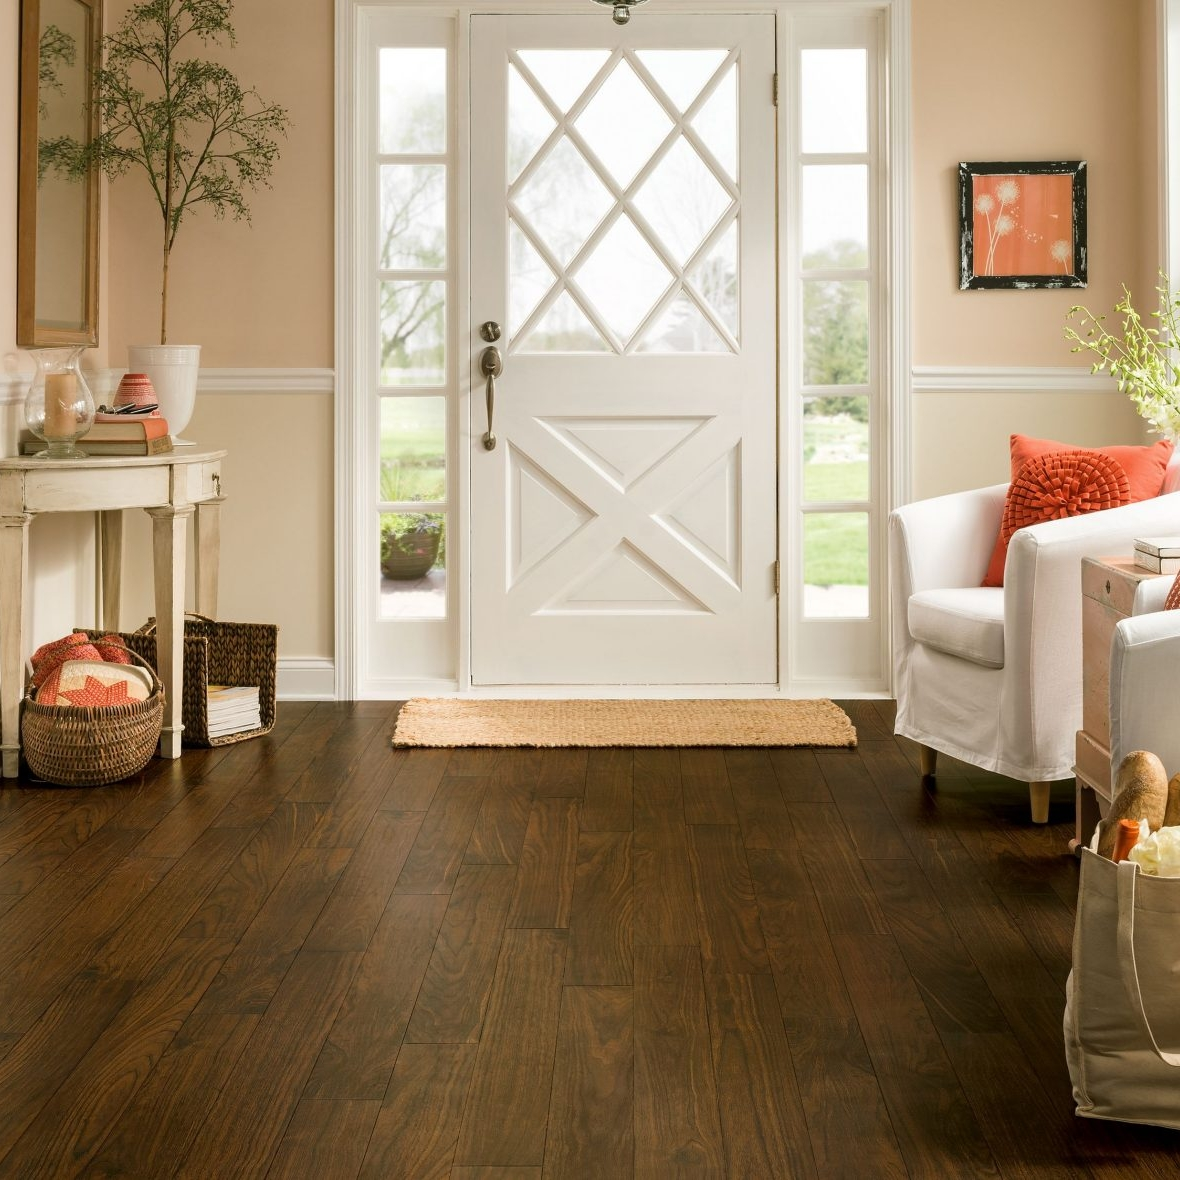 Peachtree Flooring Inc | Atlanta,  GA | LVT